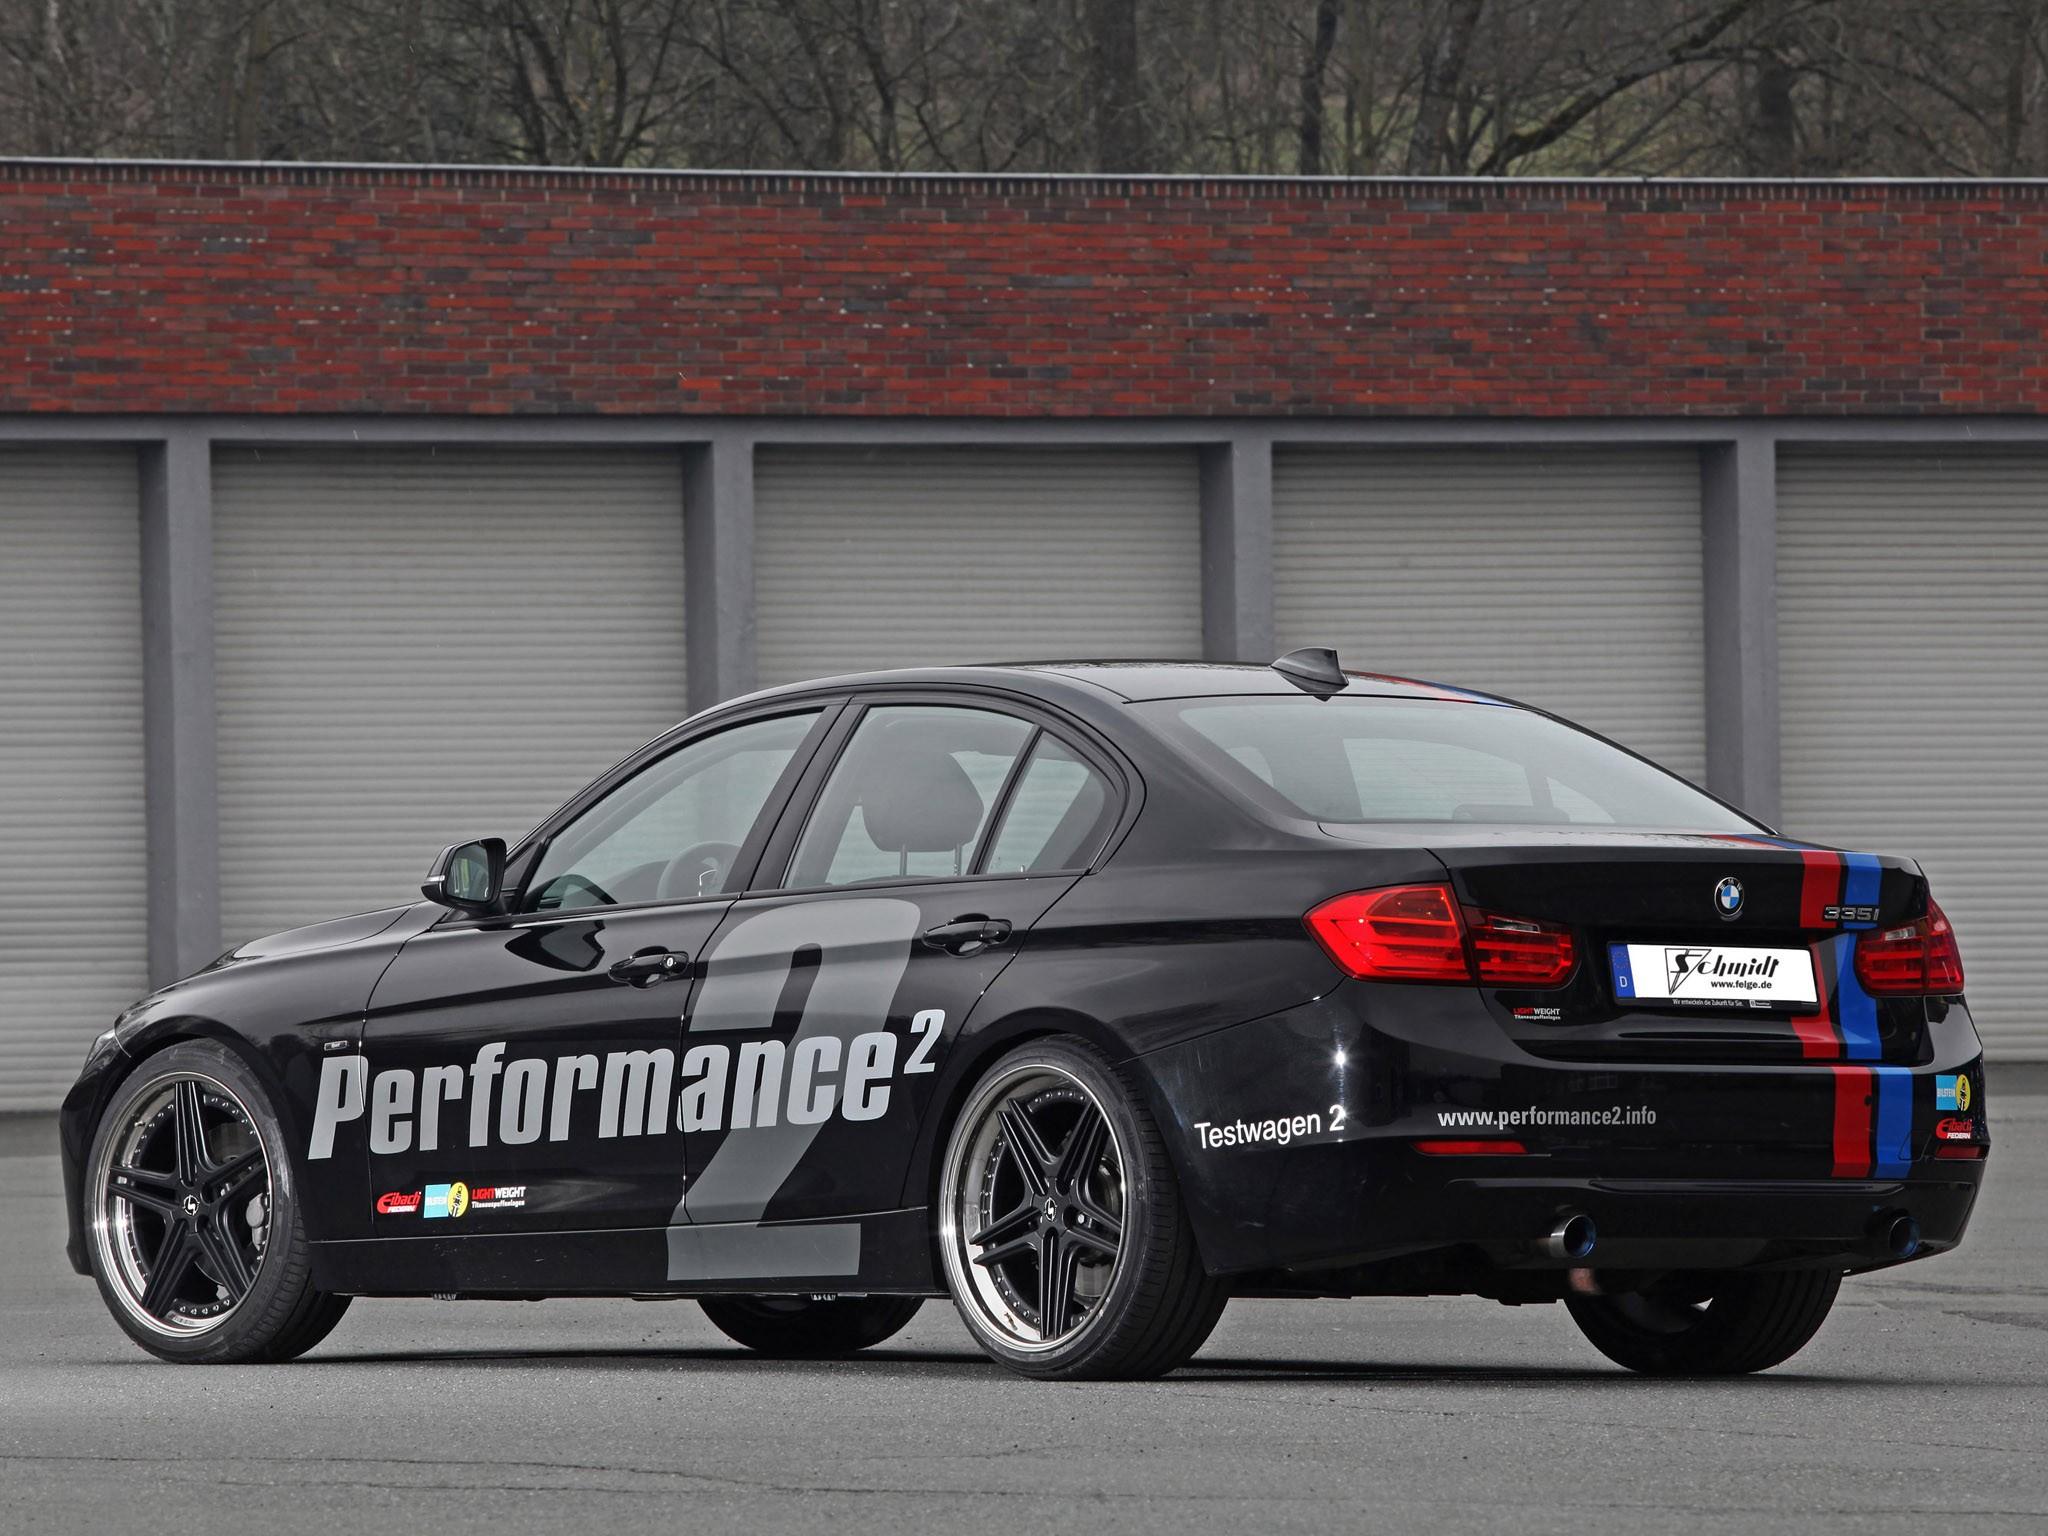 Bmw Series 3 335i F30 (2013) - Schmidt Revolution